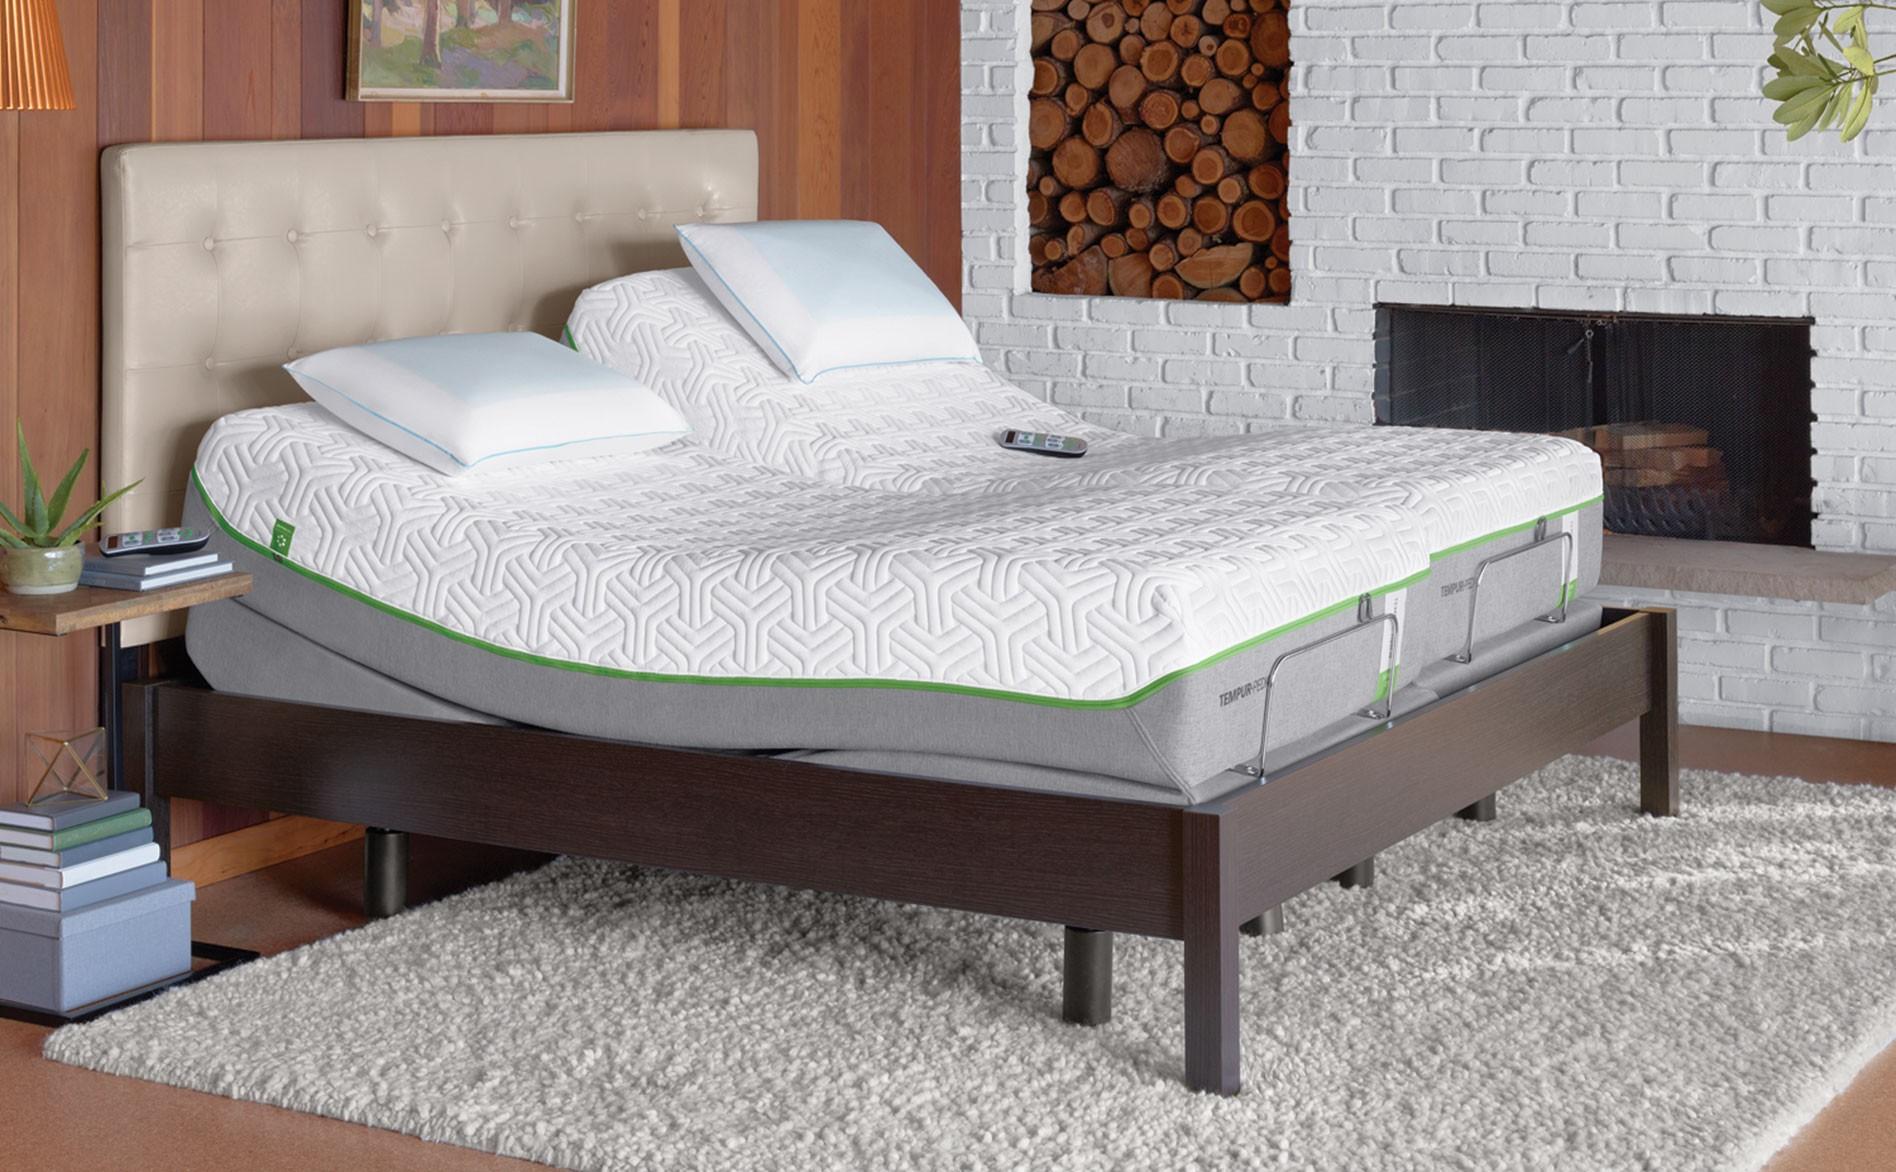 Bedroom With White Gray Tempurpedic Adjule Base Design Creamy Tufted Headboard And Furry Rug